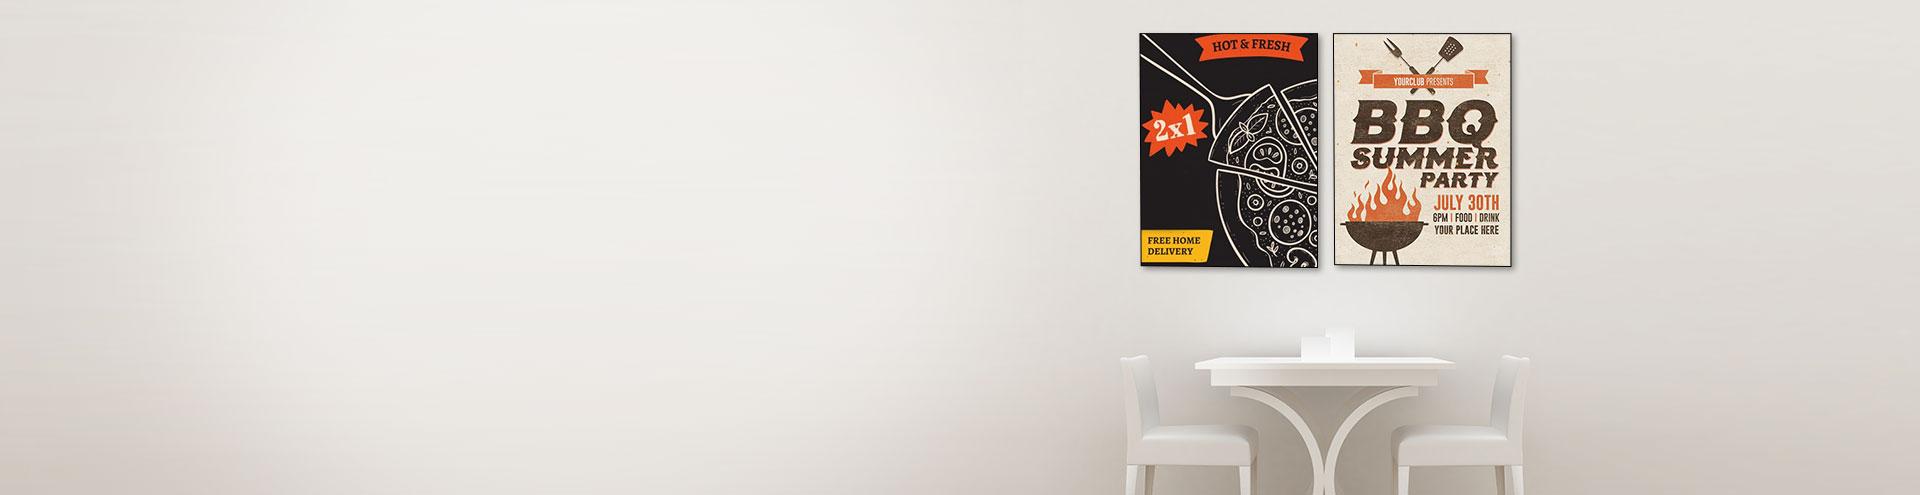 poster print canada online custom poster printing